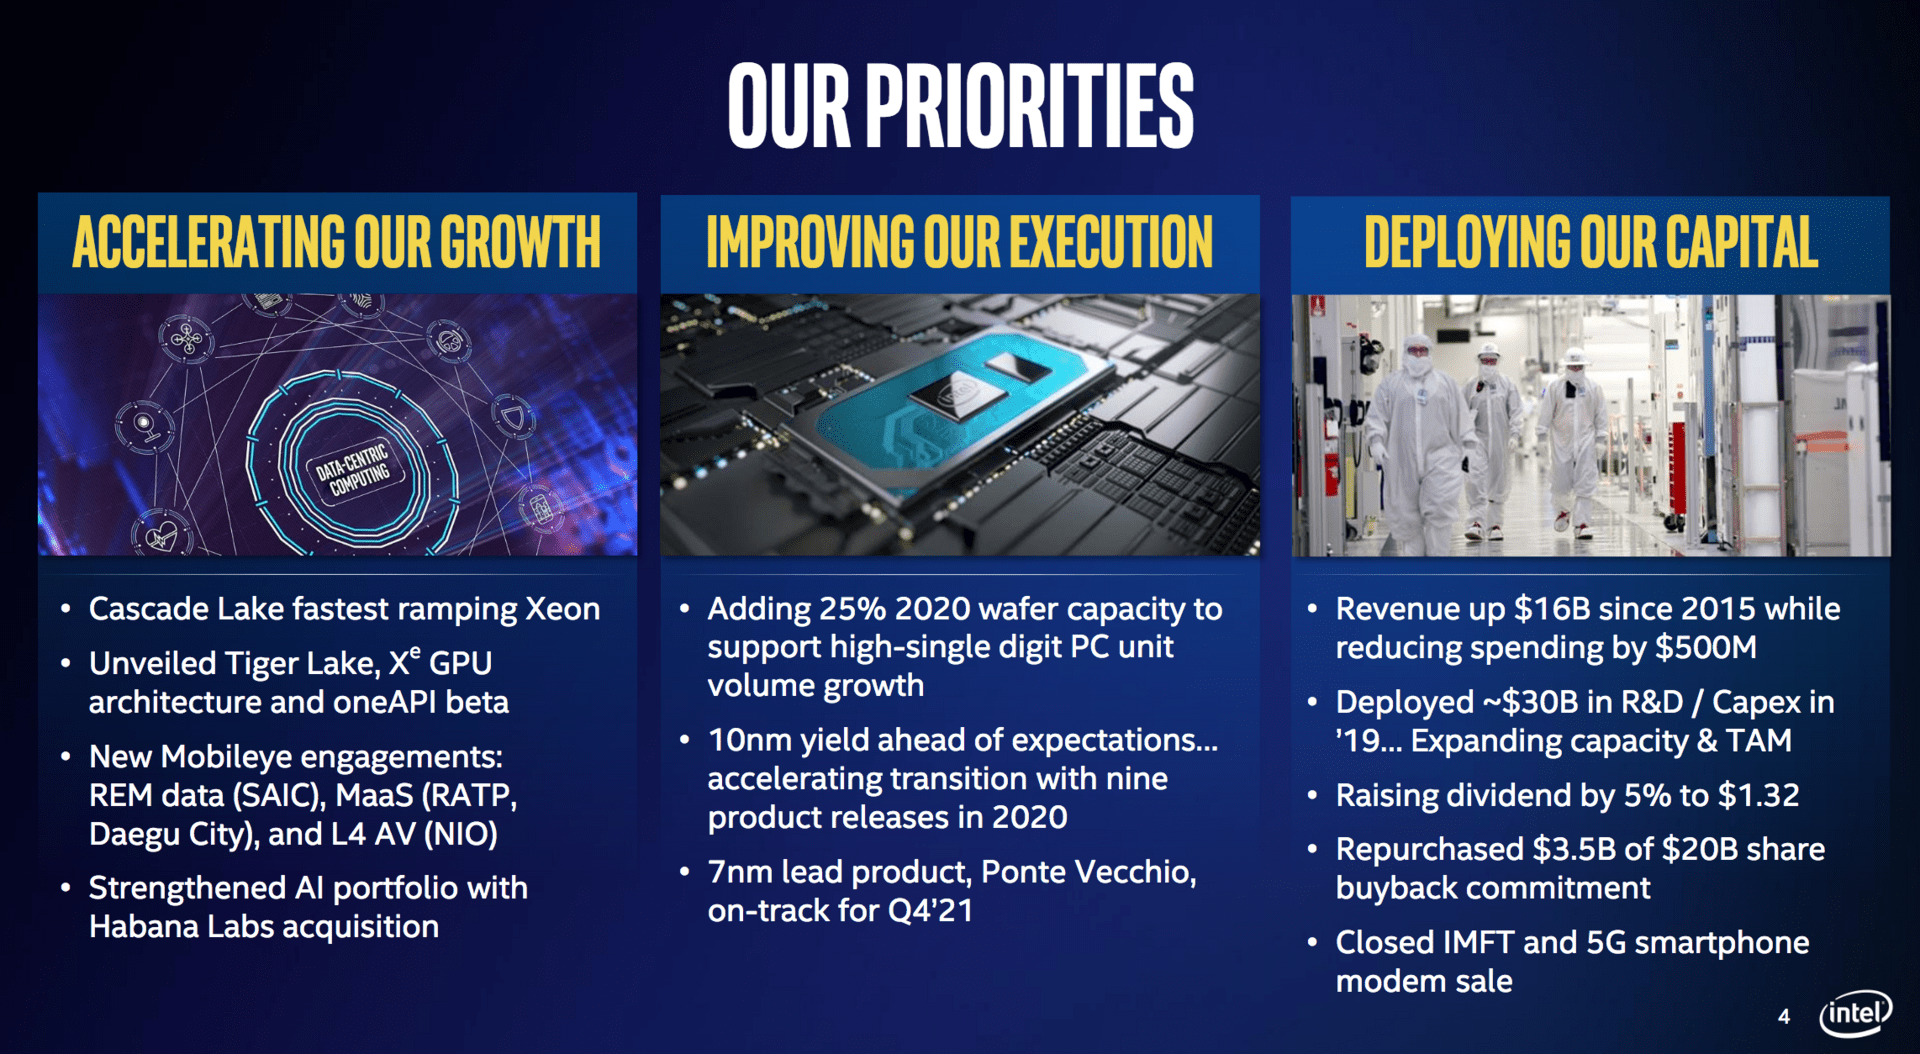 Intels Prioritäten